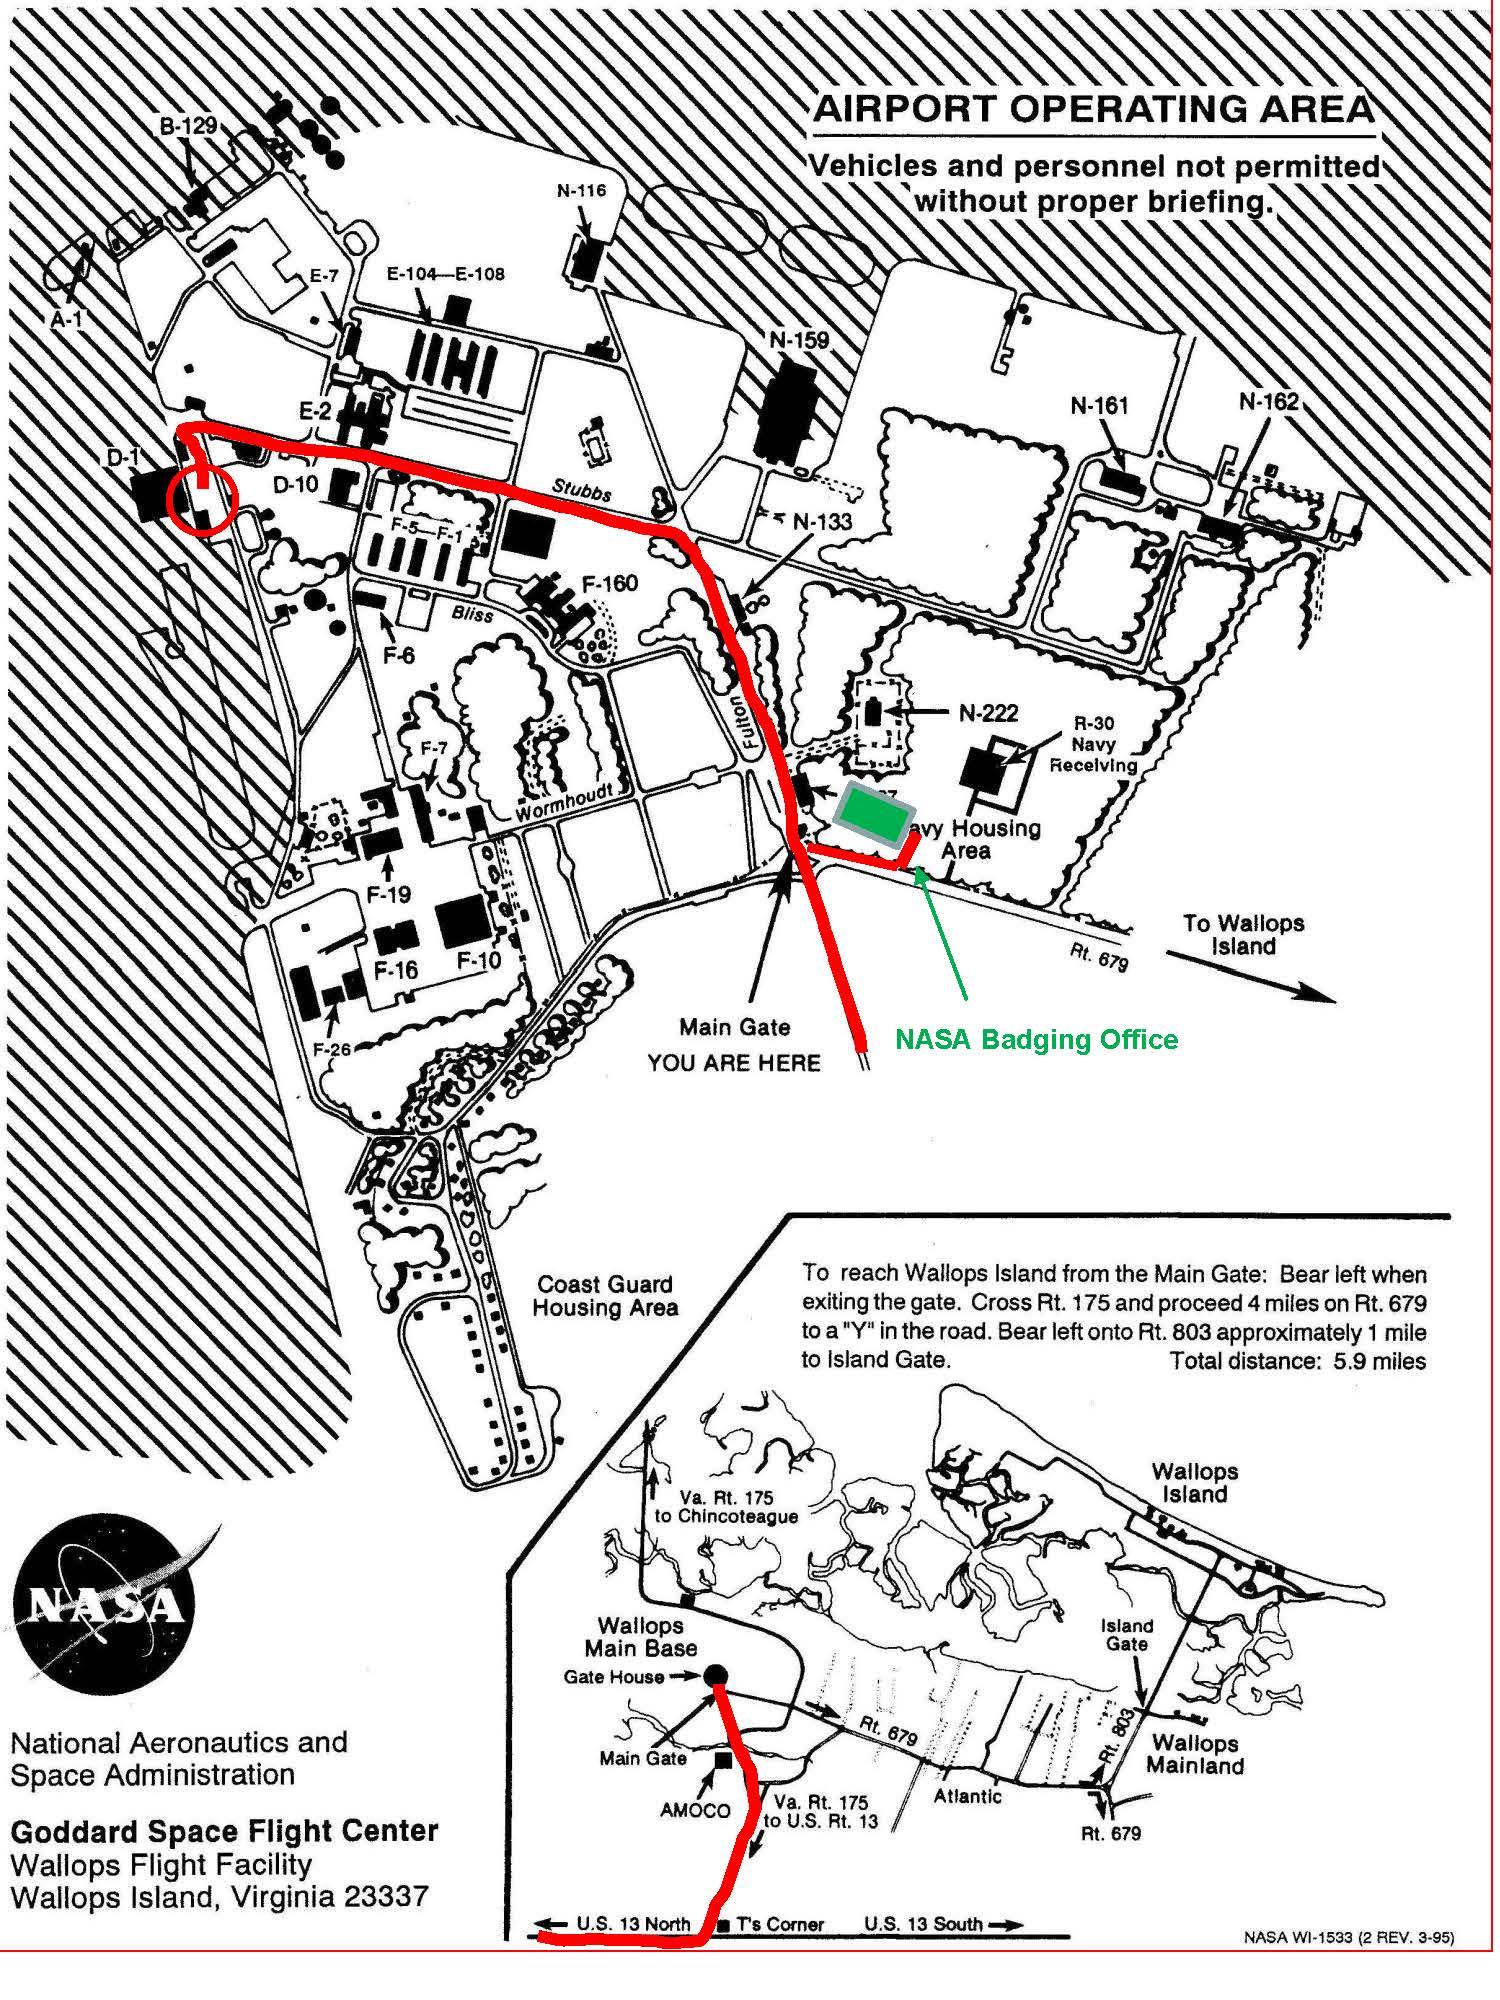 Wallops Island Flight Facility Map